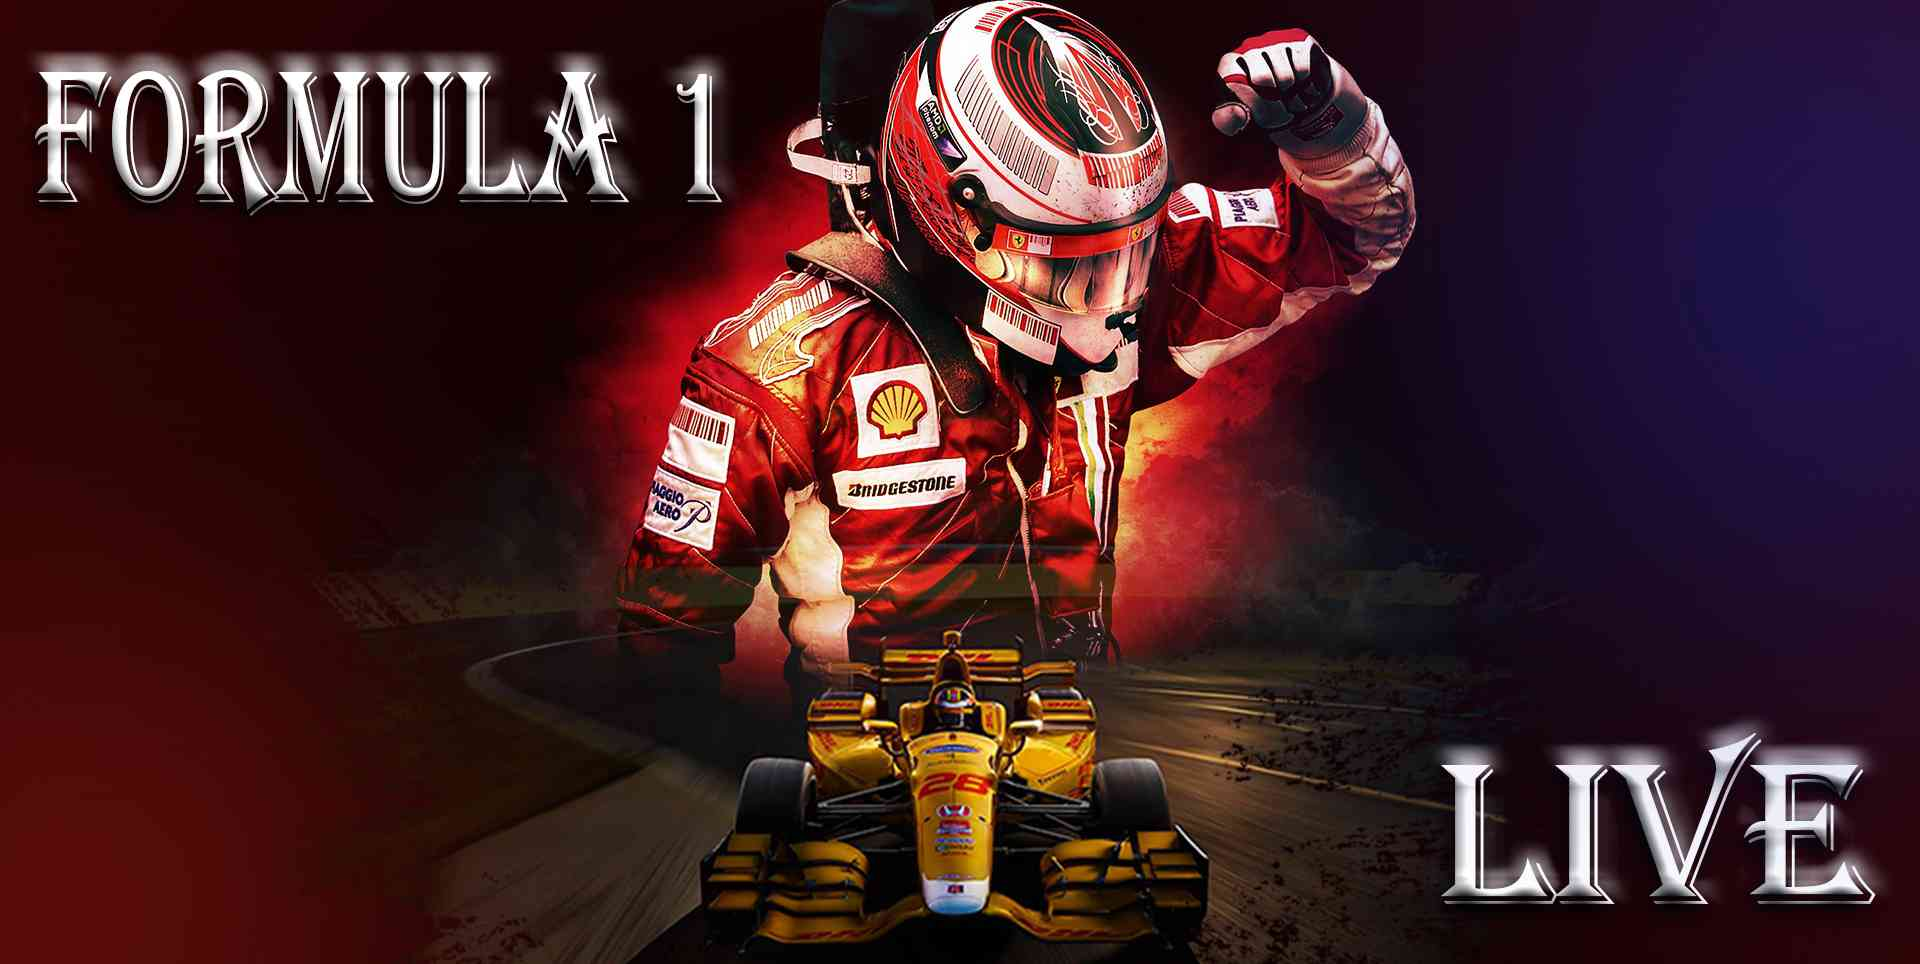 Live 2016 American Formula 1 Grand Prix Online